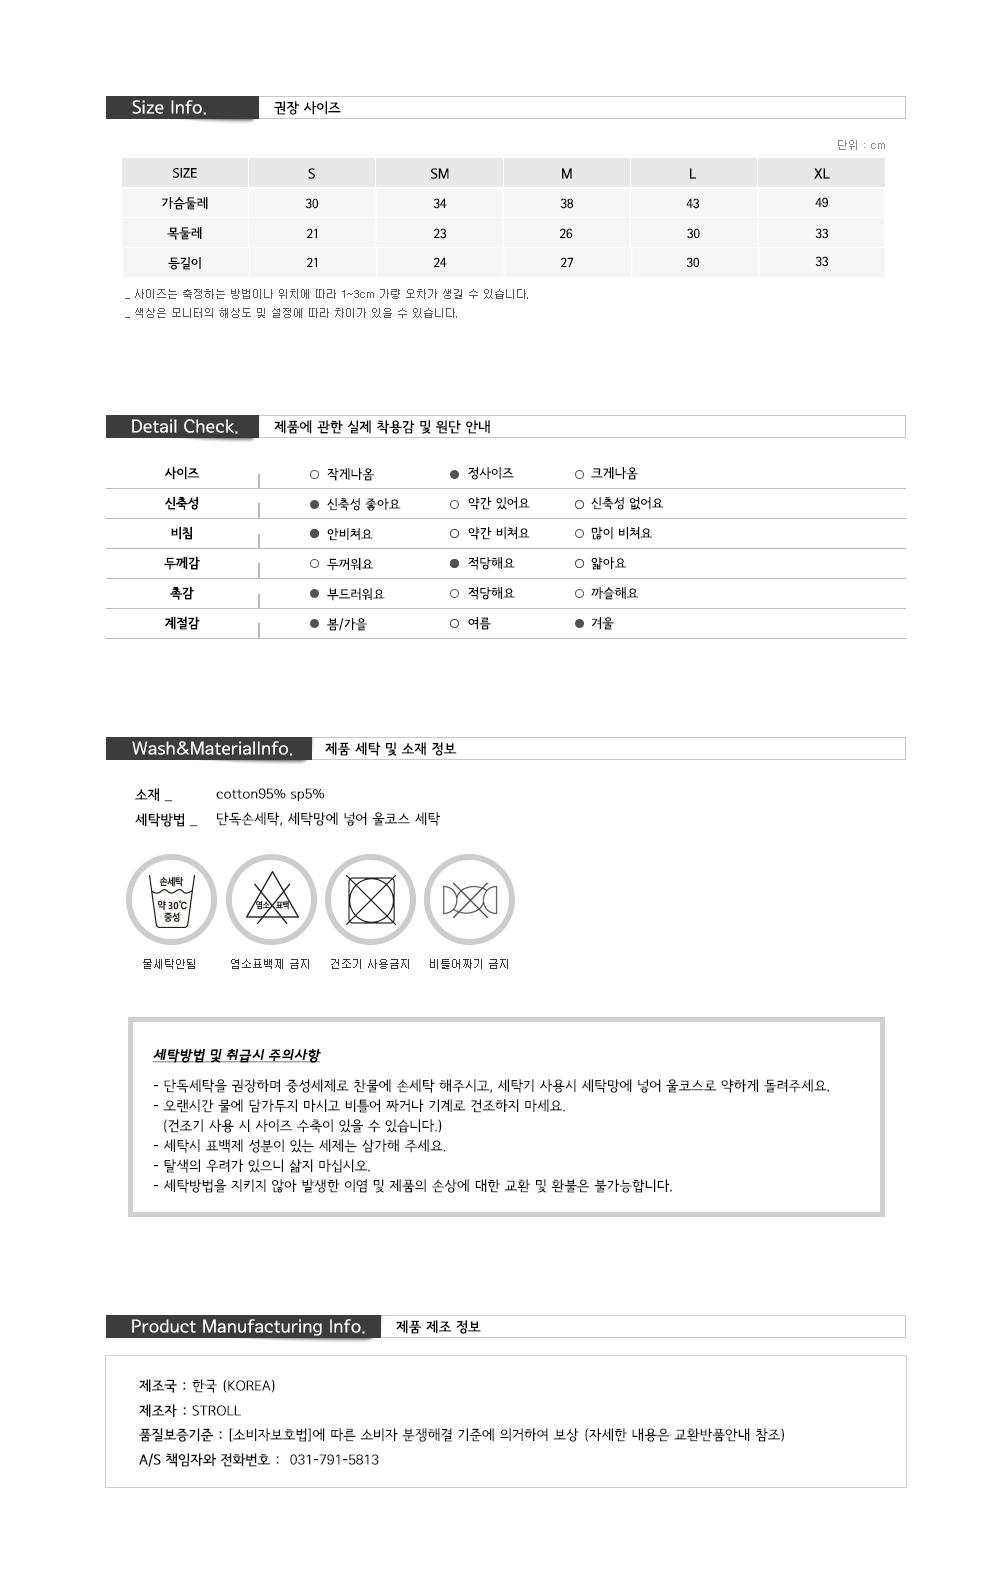 detail_info_teddy_zip-up_134923.jpg